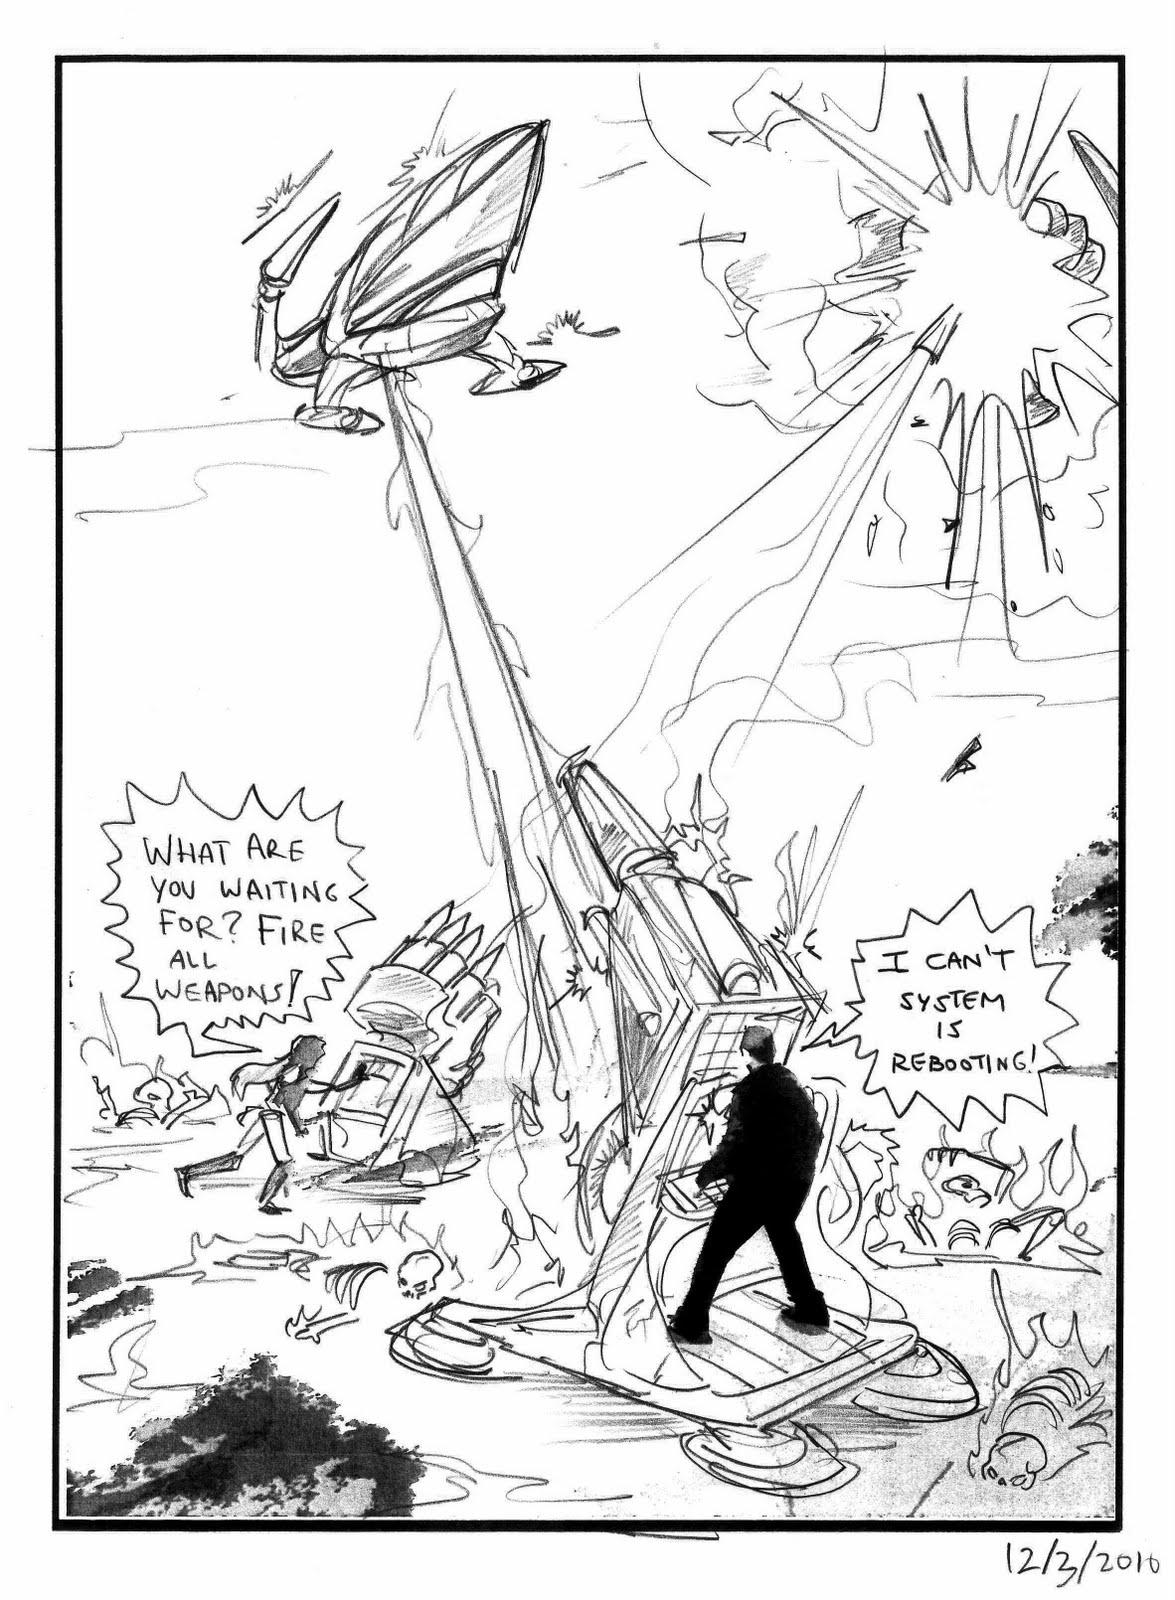 Kid Sketches: Sample Rough Comic Pages Bundle